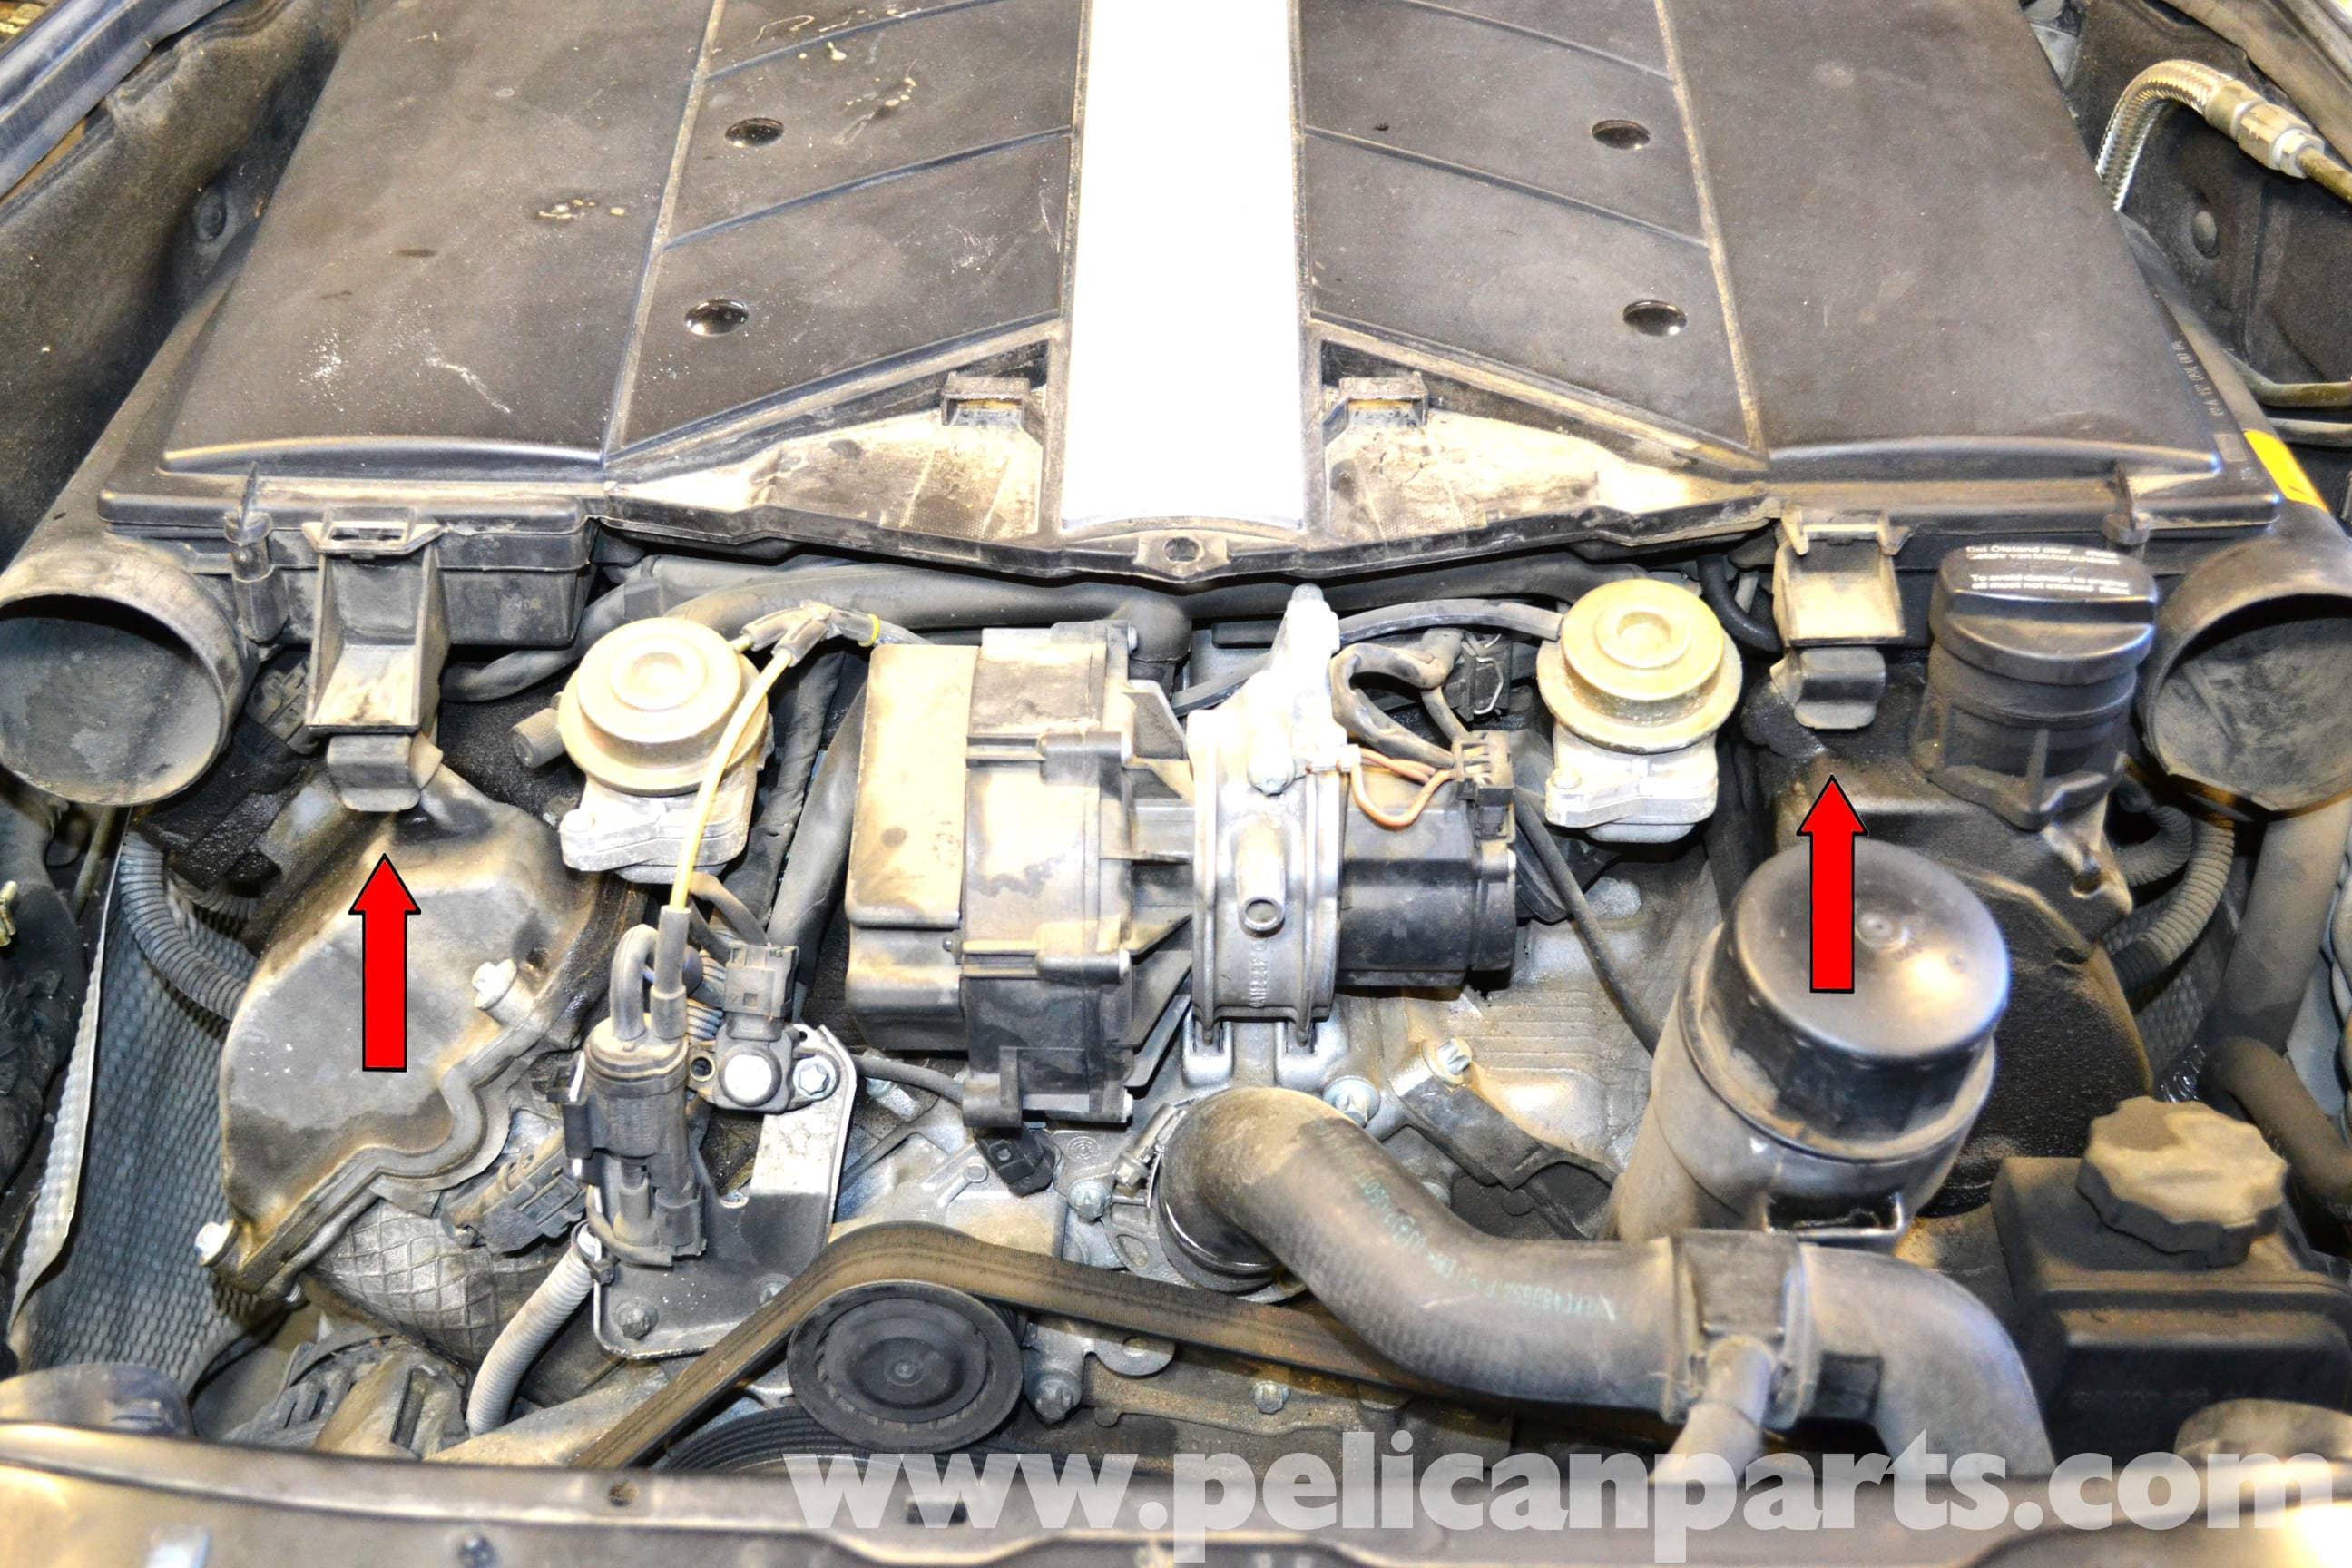 Mercedes Benz Ml Not Changing Gears